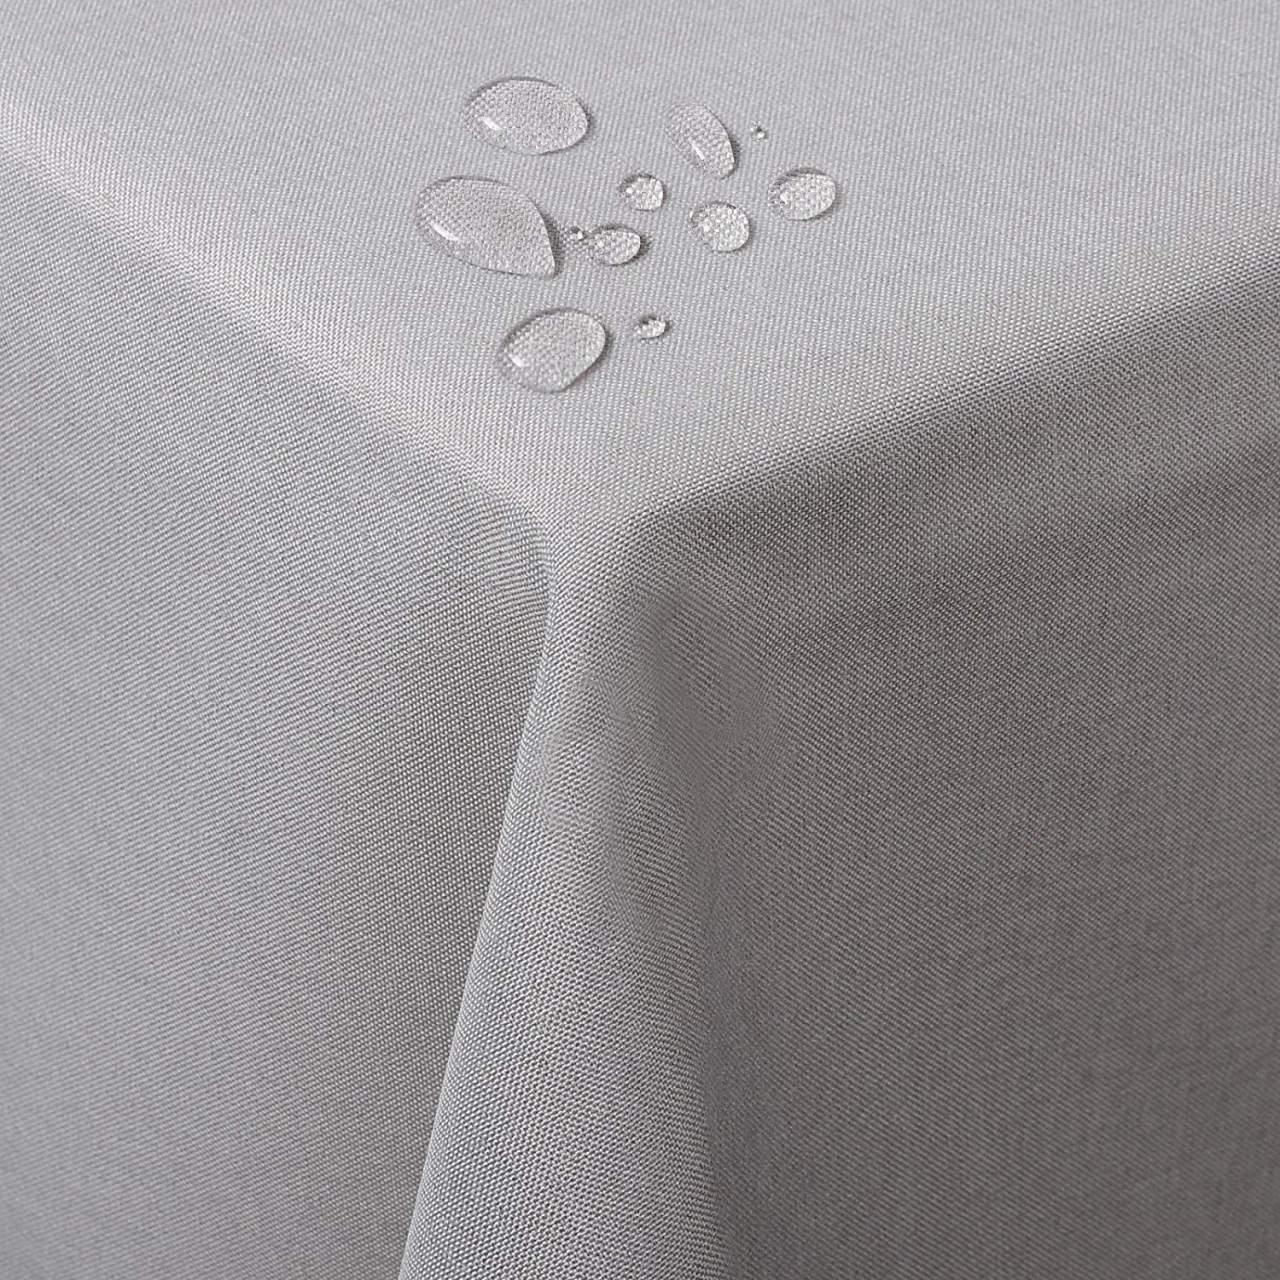 Mantel ⬛ GRIS CLARO Color Liso ·1,5x1,5m· [enstockpara envíooretiro]